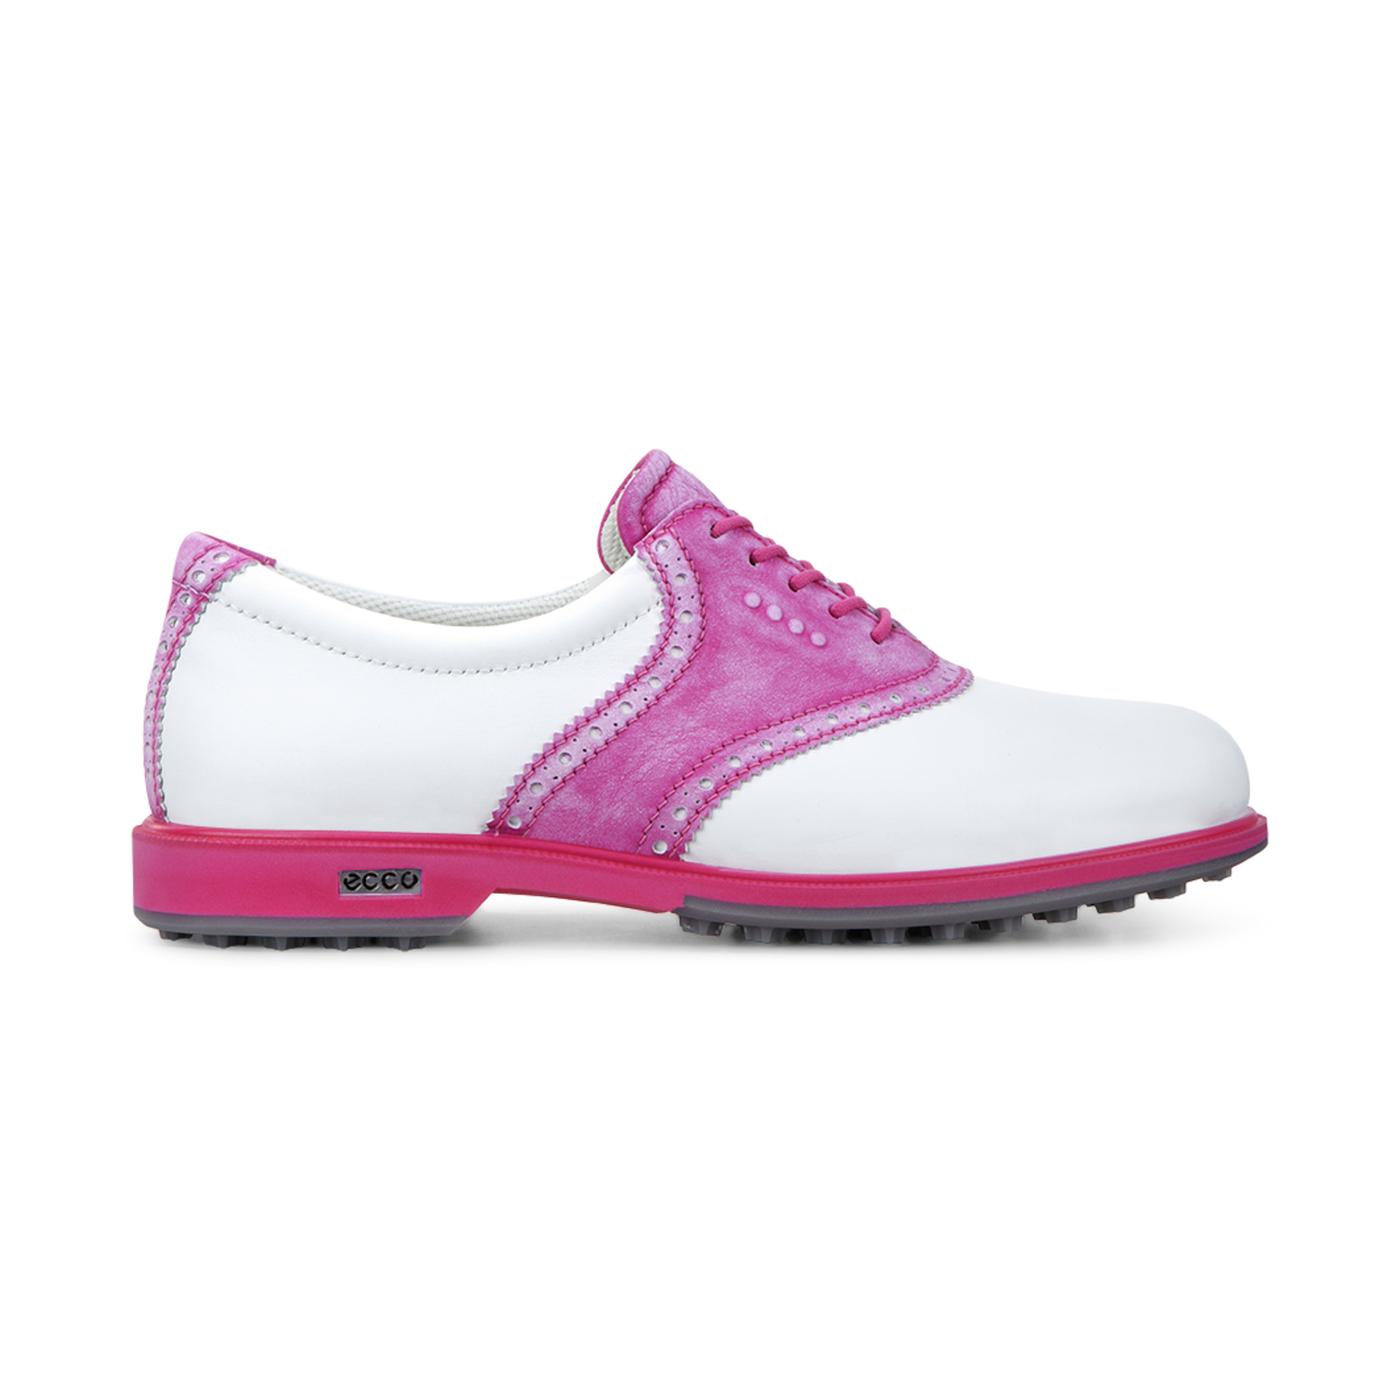 ECCO CLASSIC HYBRID II Golf Ladies